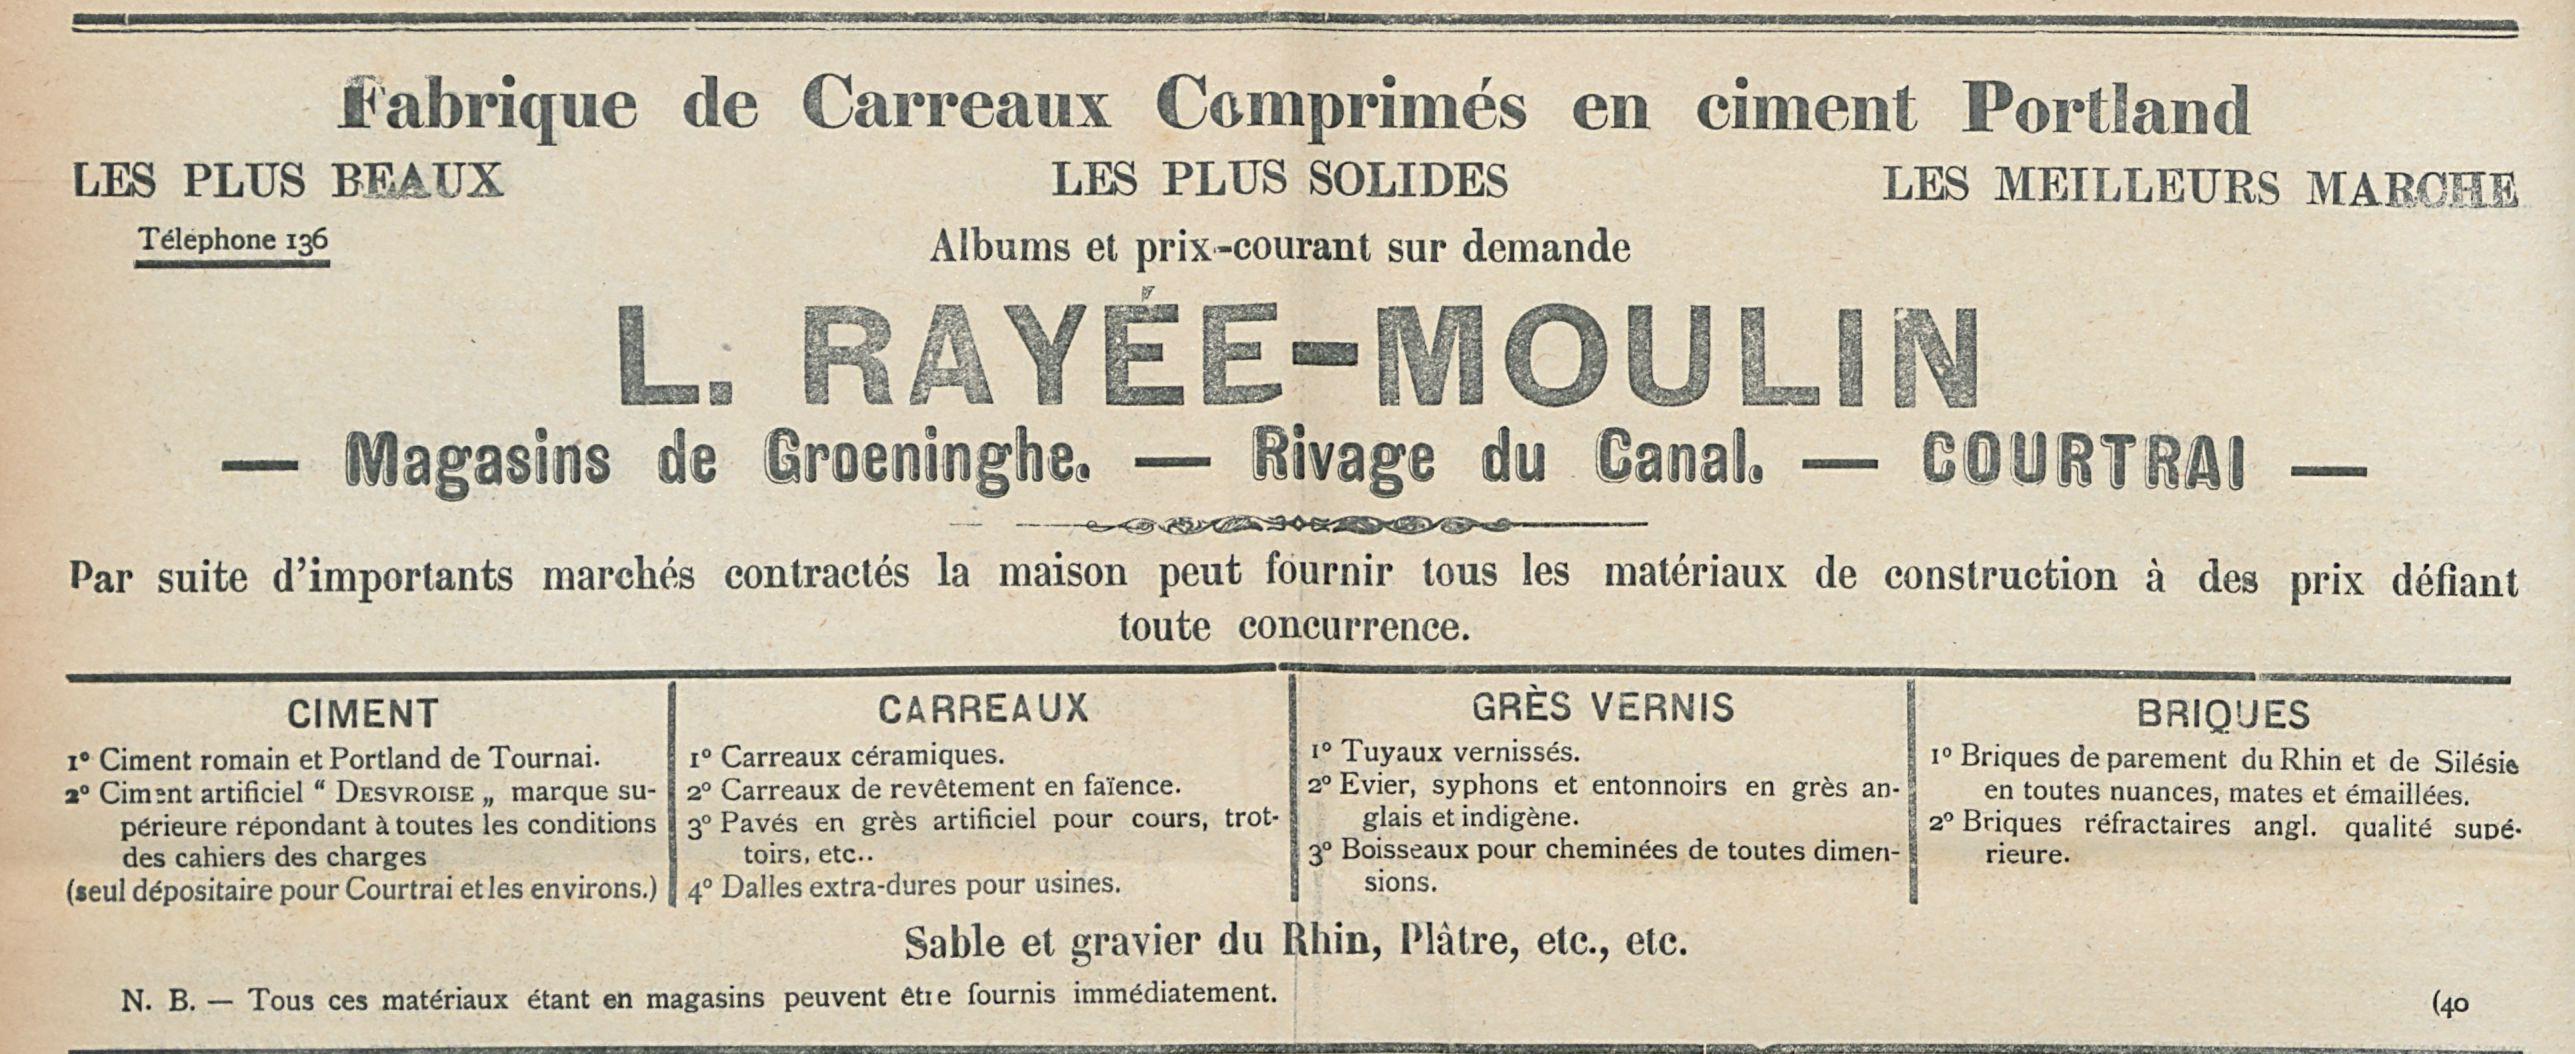 L. RAYEE-MOULIN